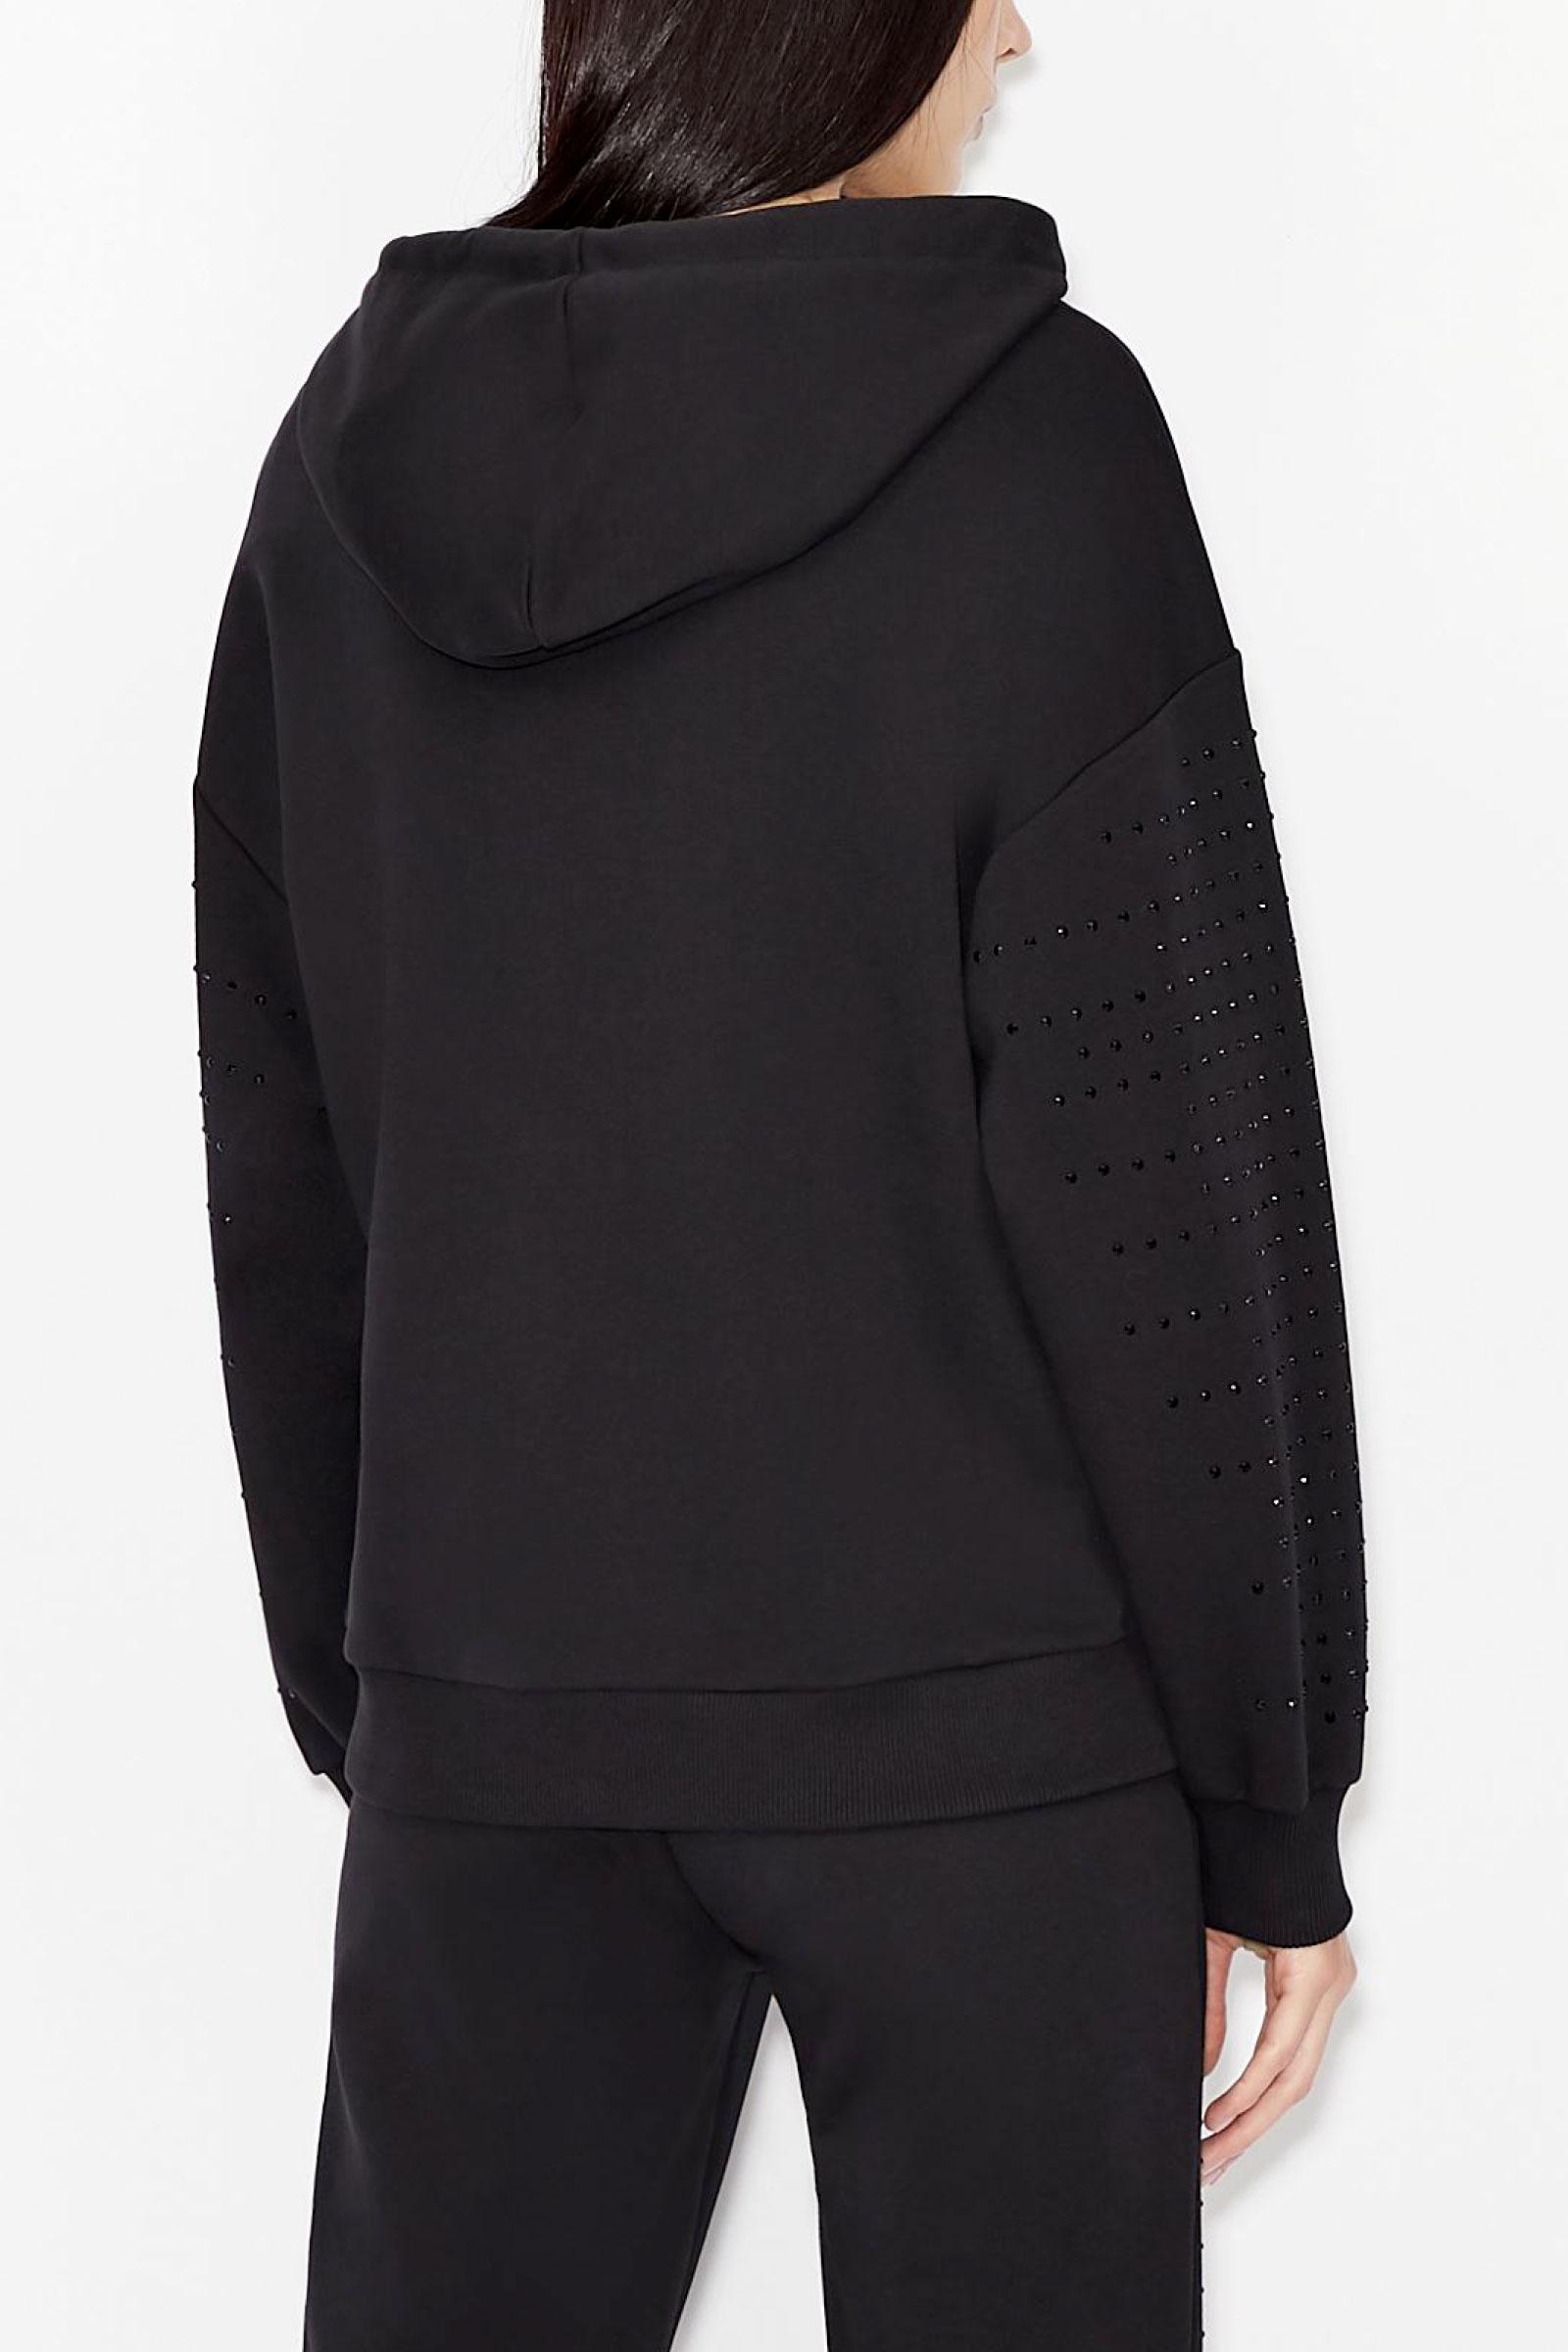 ARMANI EXCHANGE | Sweatshirt | 6KYM86 YJ6PZ1200